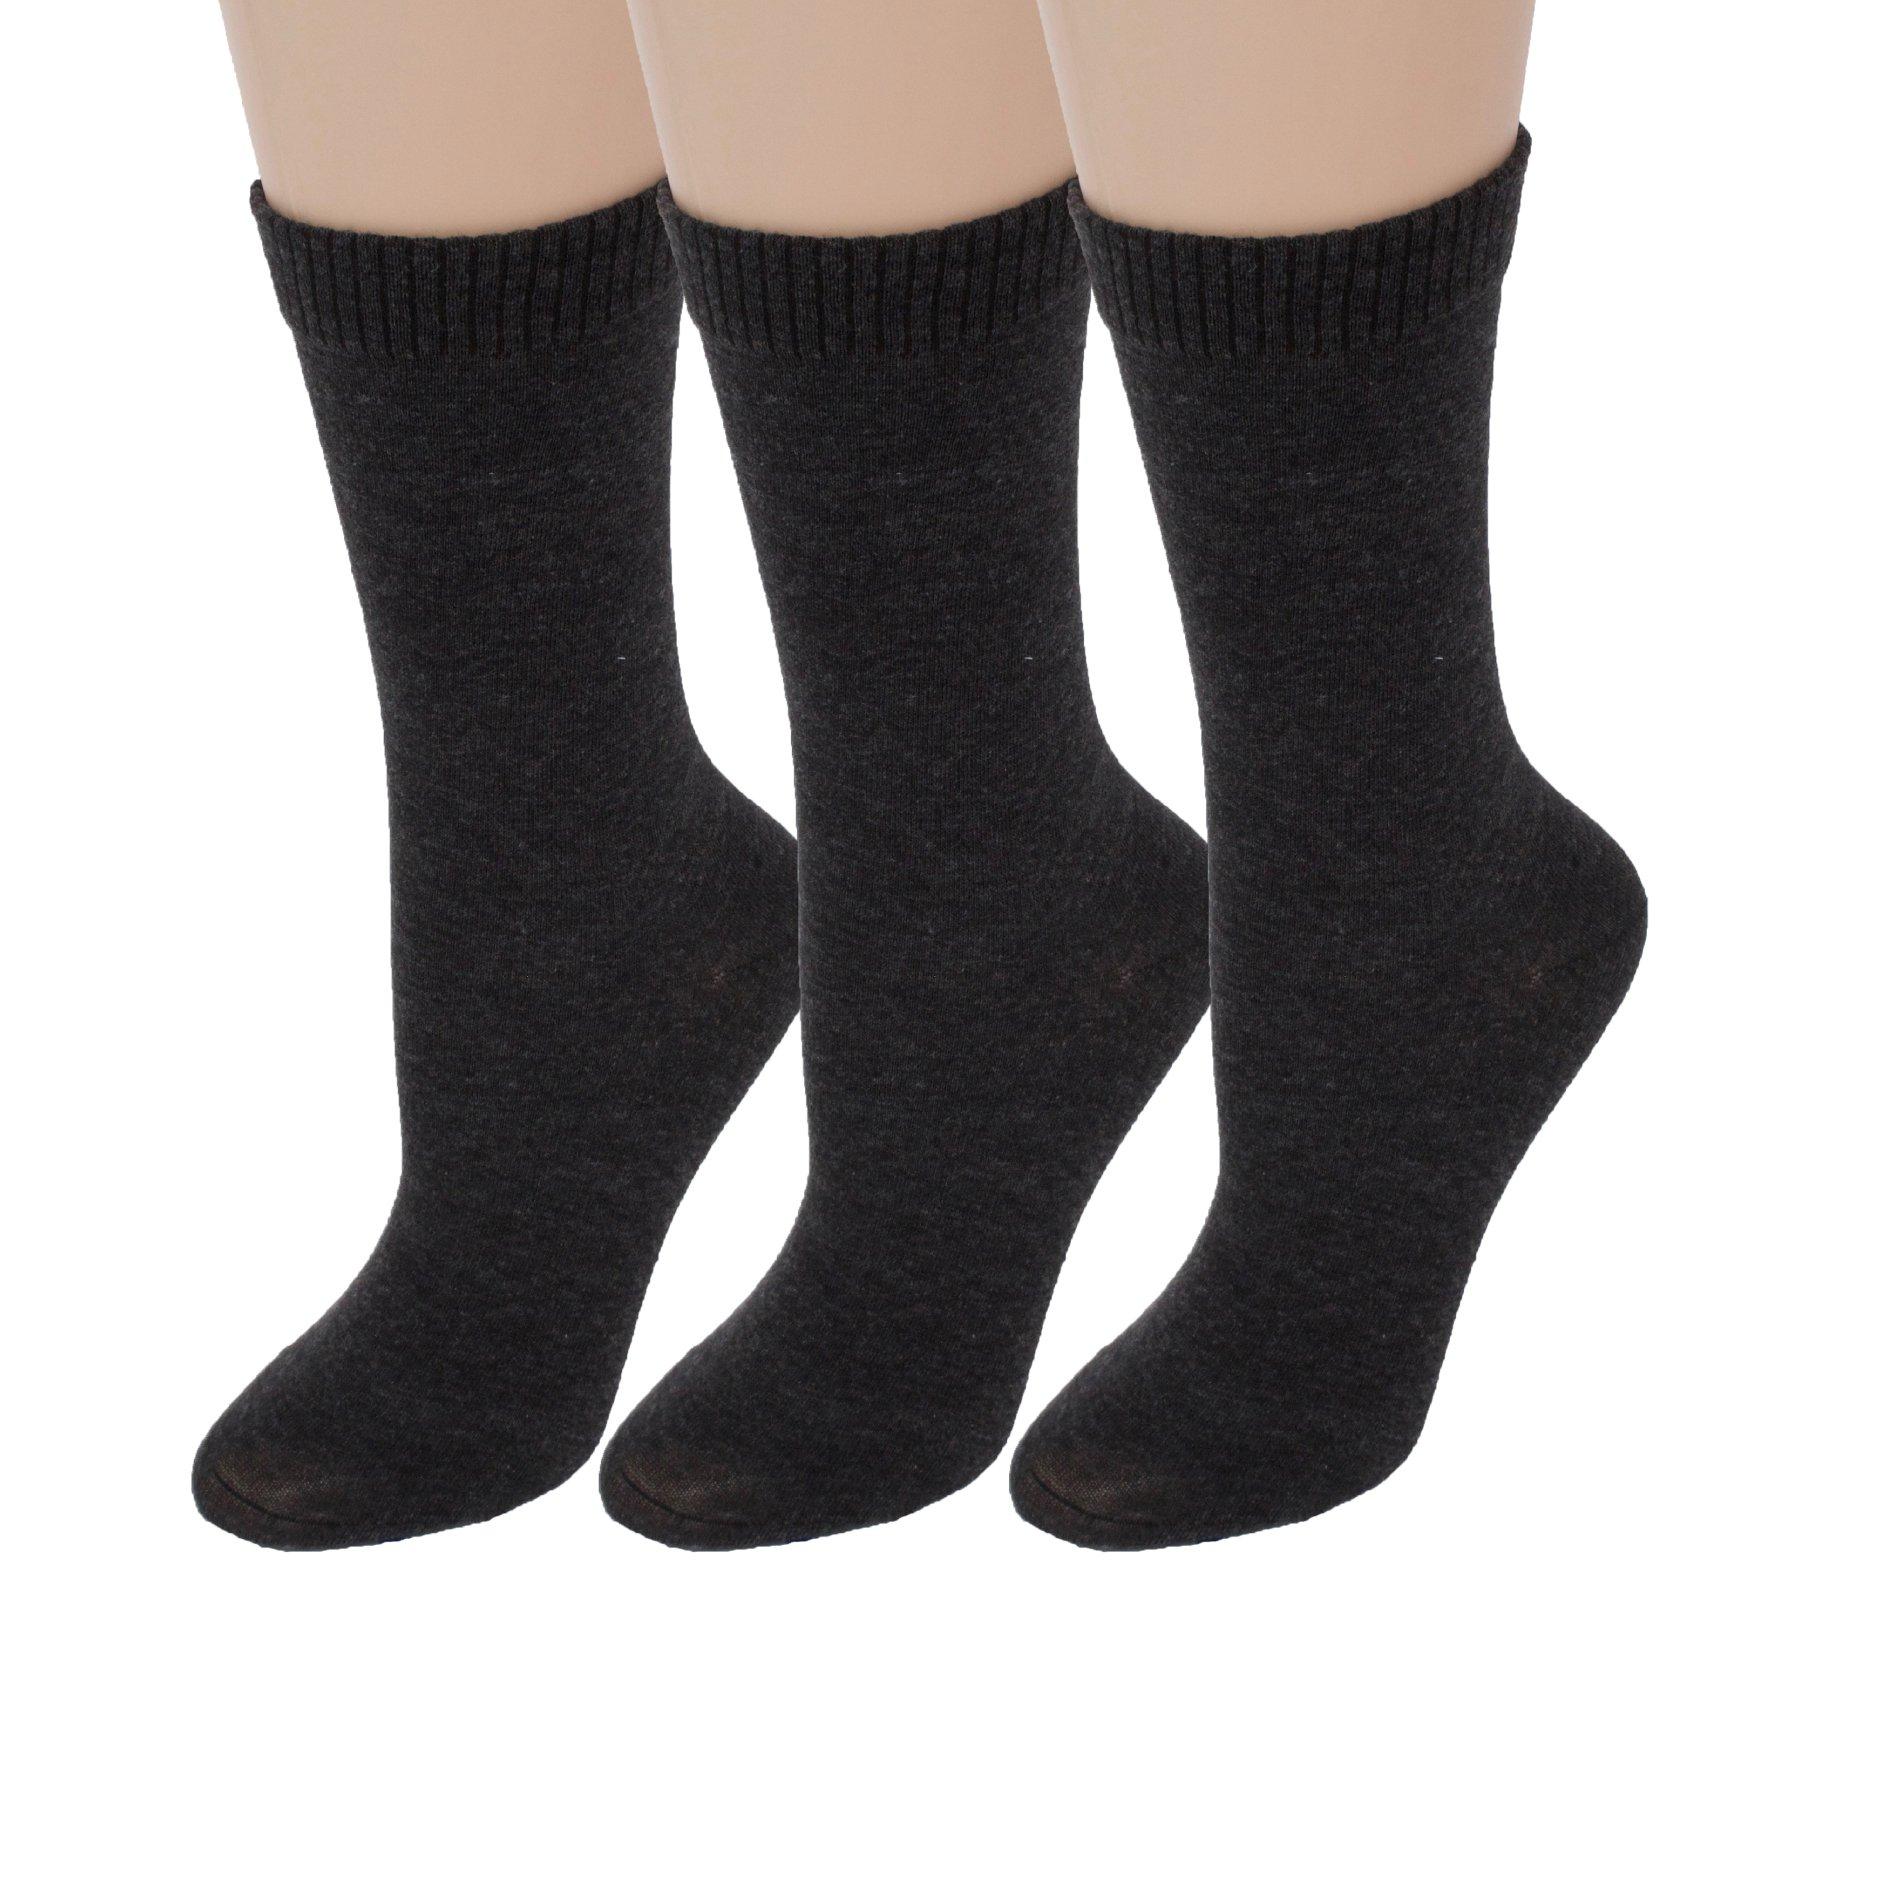 Diabetic Socks | Womens Grey Crew 3 Pack | Seamless Toe | Non-Binding Top | Sock Size 9-11 | Improve Foot Health Comfort Circulation for Diabetes, Varicose Veins, Maternity Pregnancy